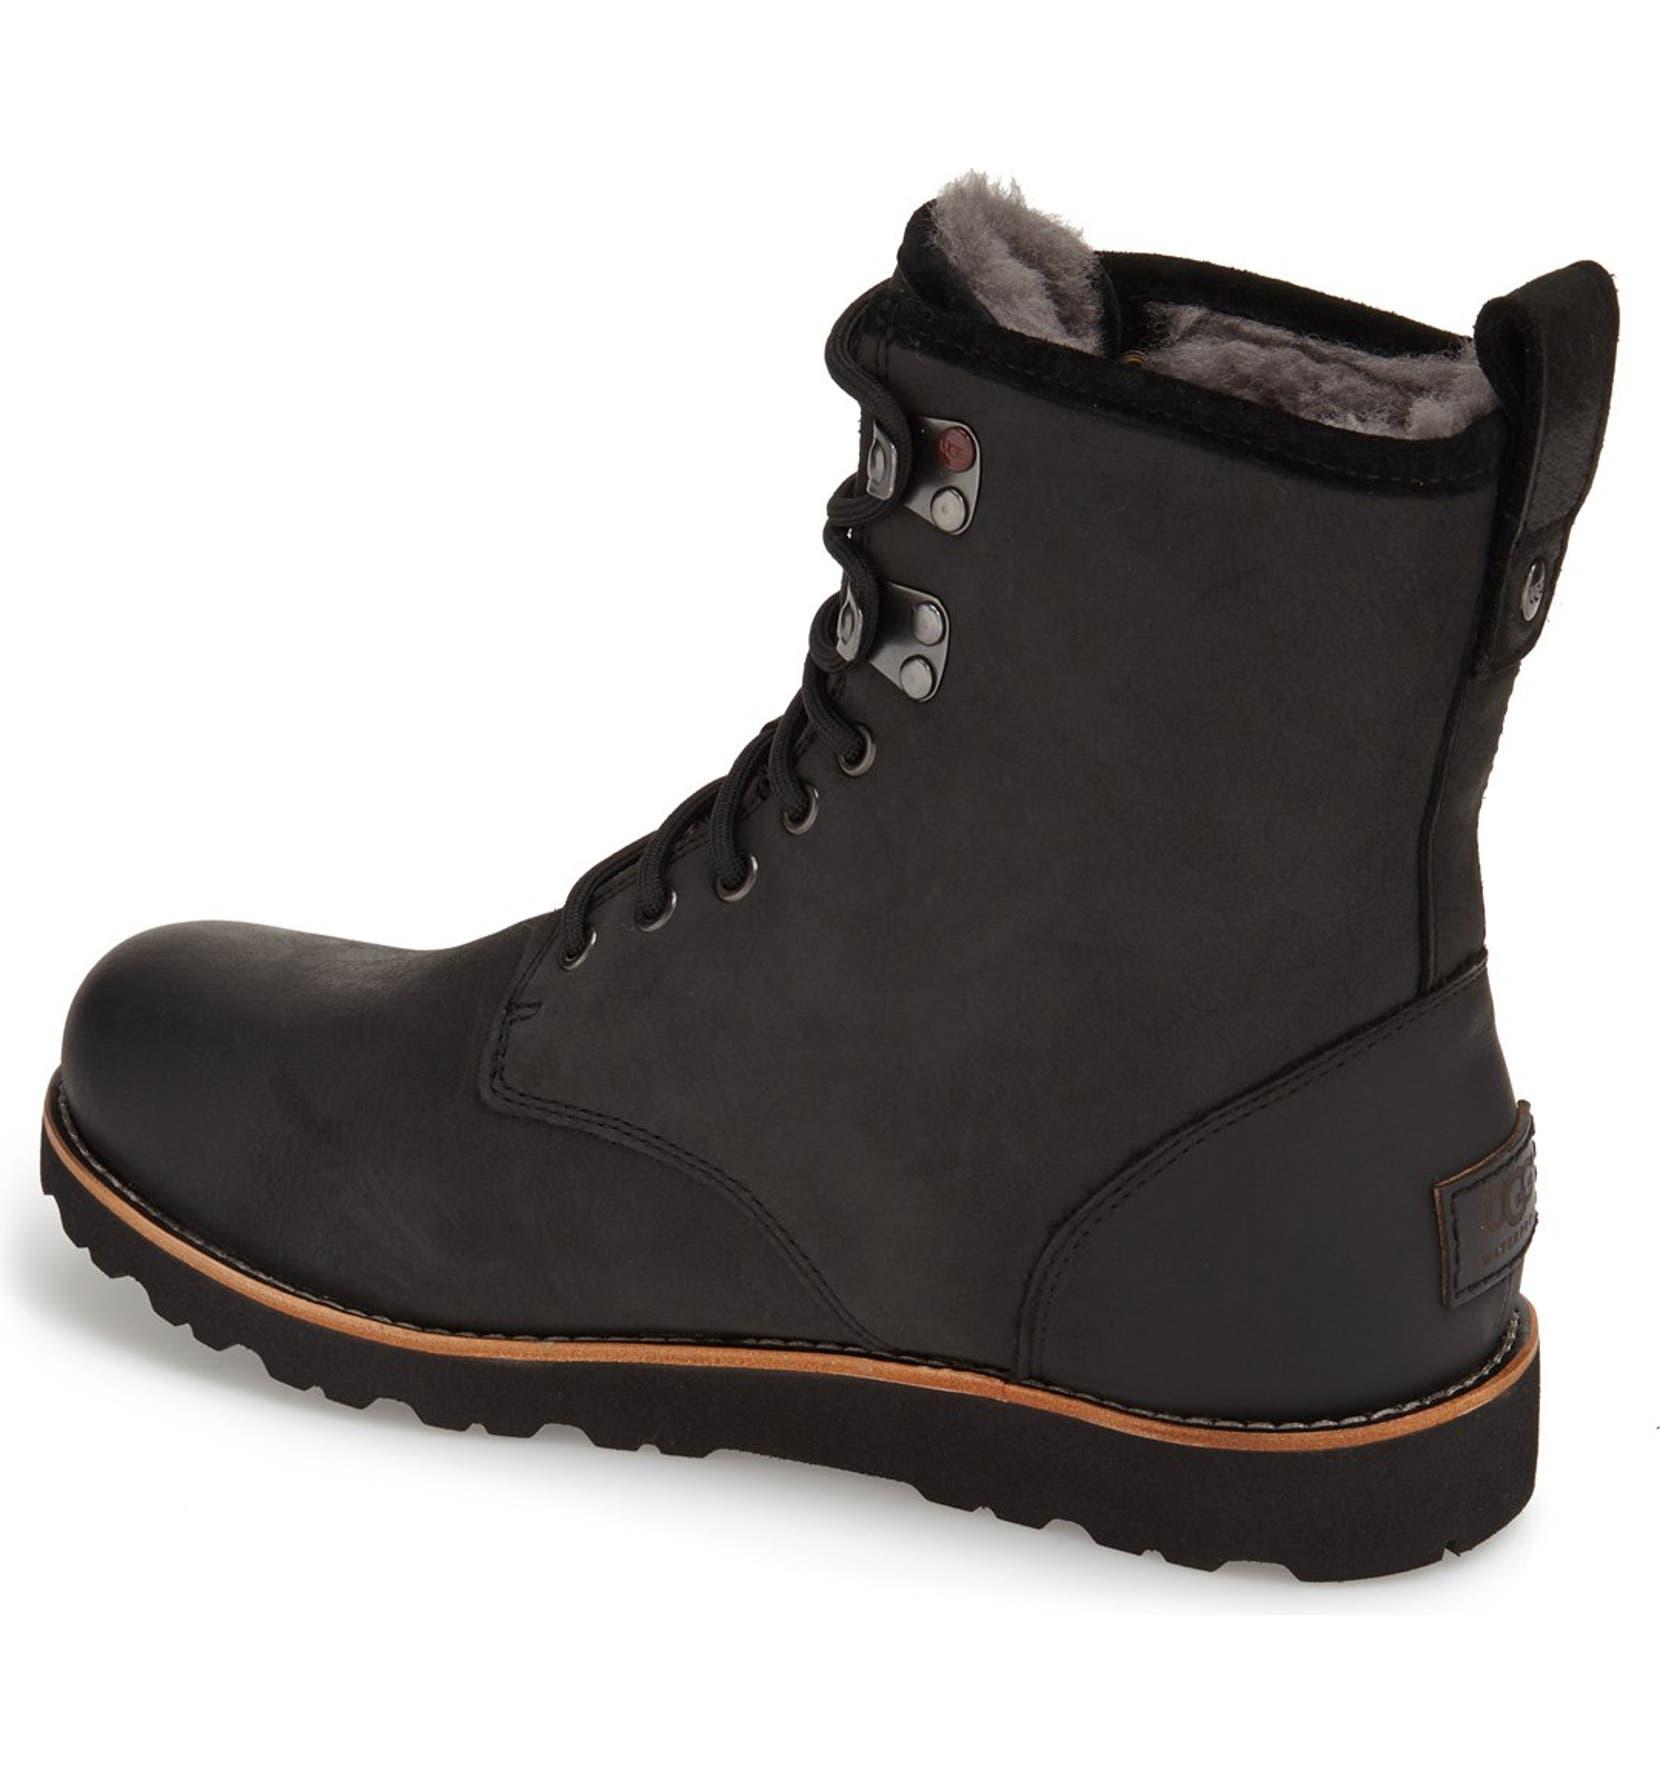 72fb6e361a8 Hannen Plain Toe Waterproof Boot with Genuine Shearling